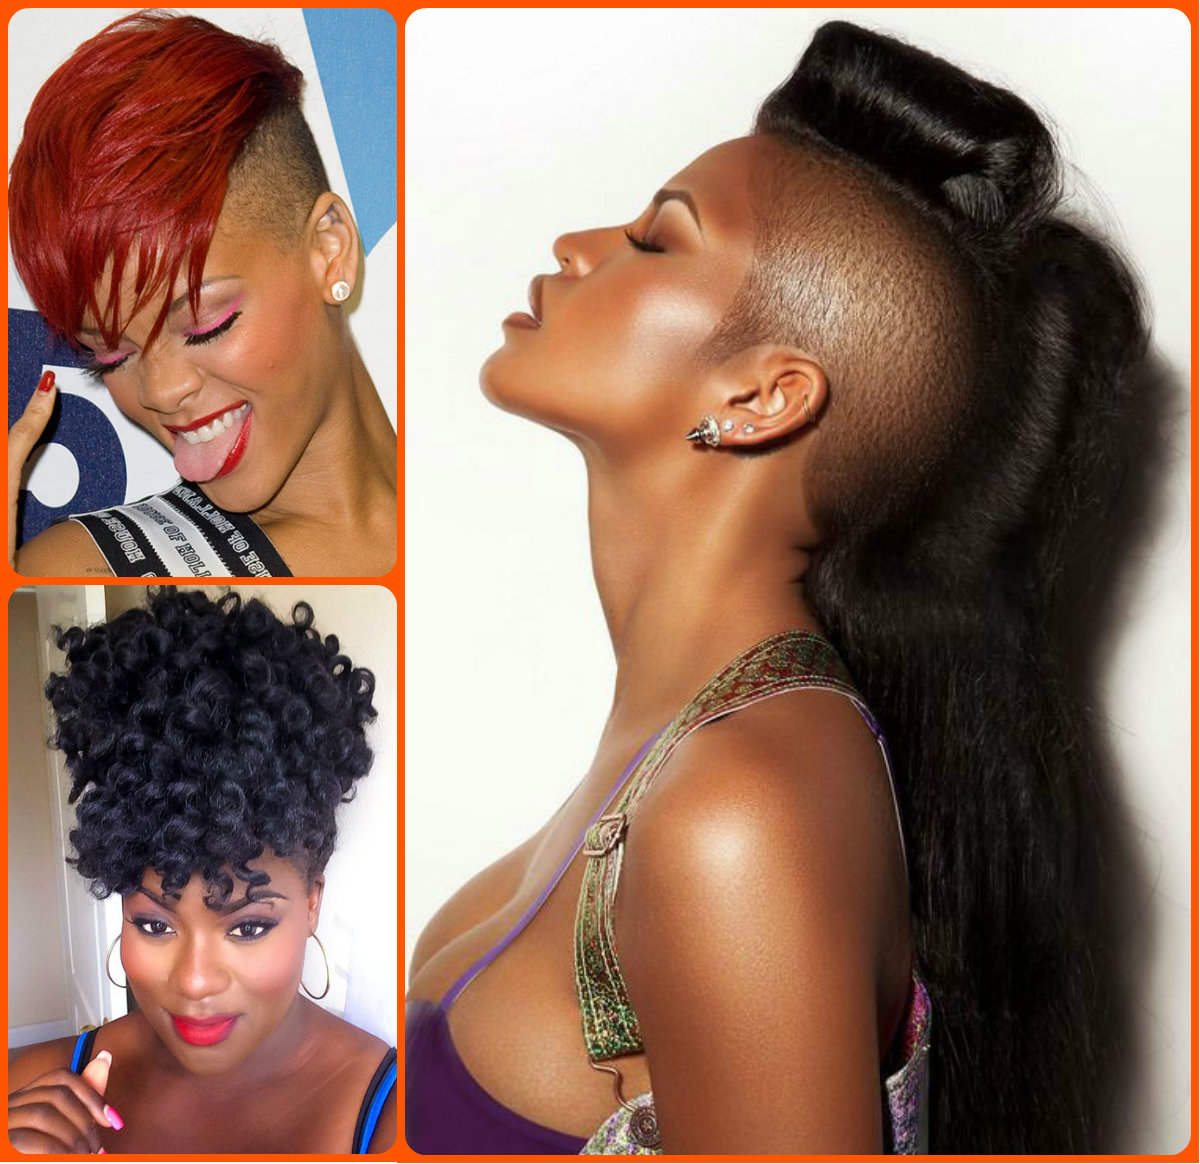 Pleasant Jazzy Mohawk Hairstyles For Black Women Hairstyles 2016 Hair Short Hairstyles For Black Women Fulllsitofus